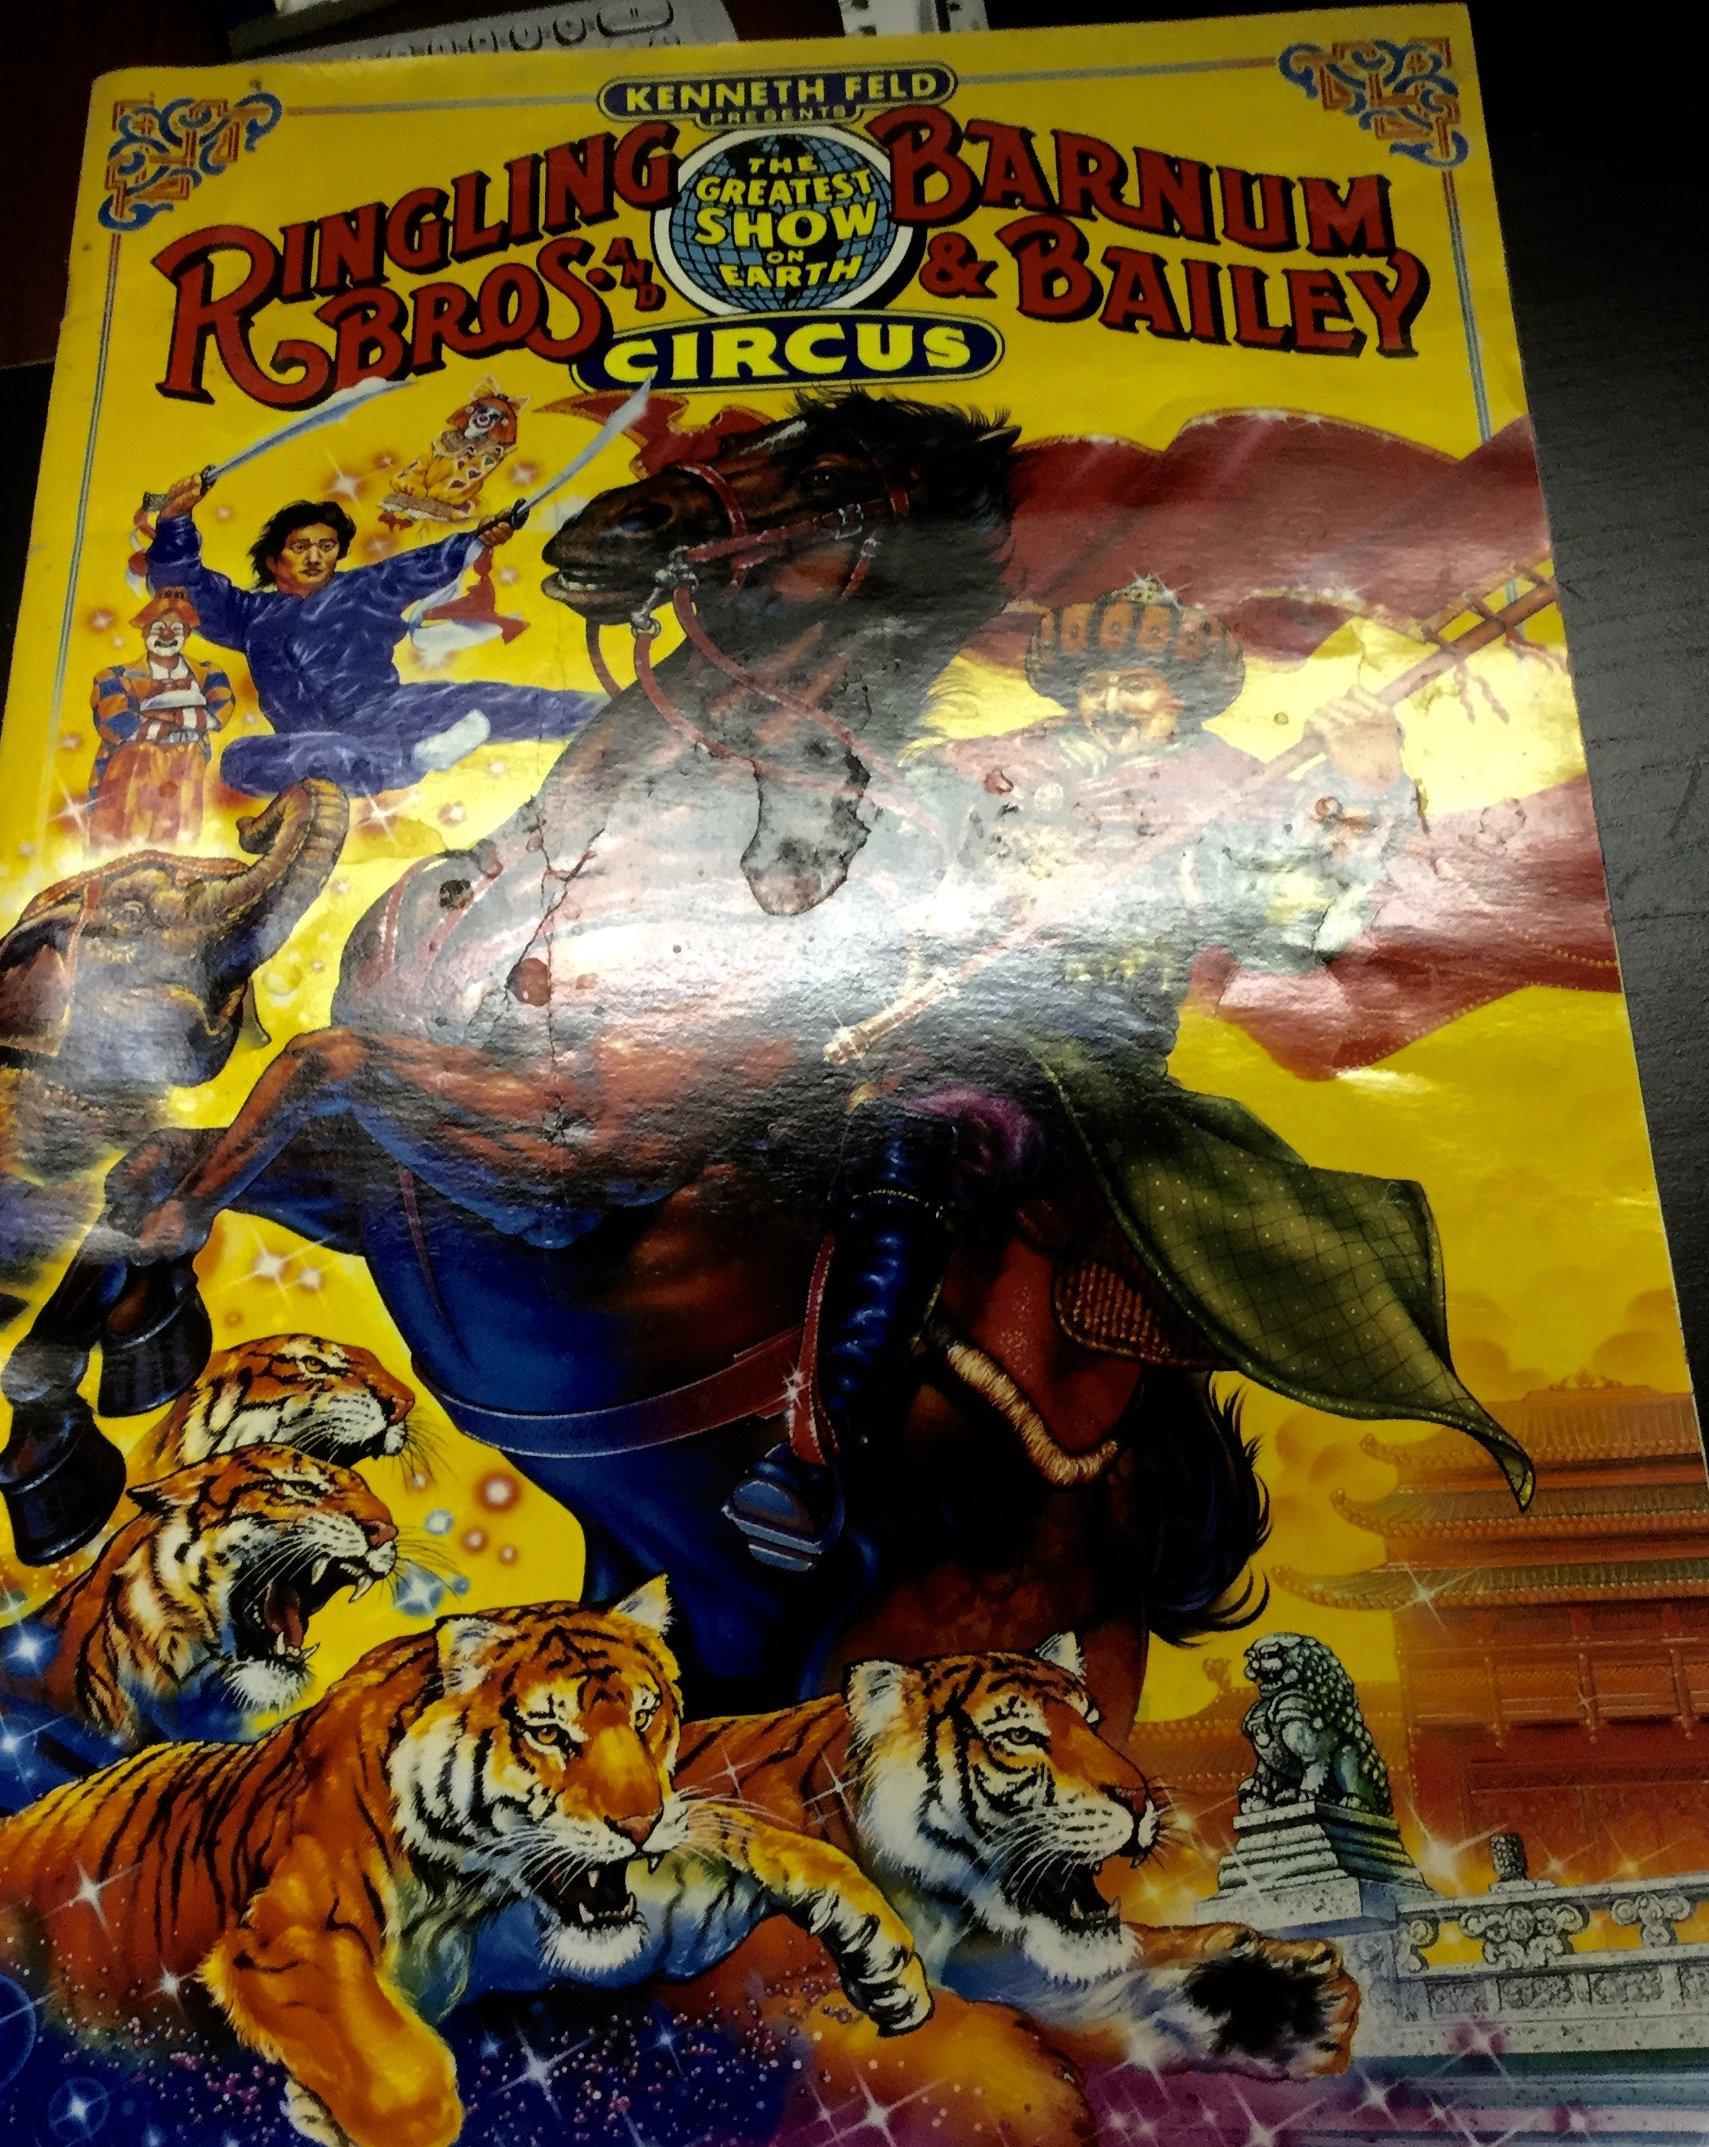 And Barnum & Bailey Circus, 1992, 122nd Edition Sourvenir Program And  Poster: Amazon: Books